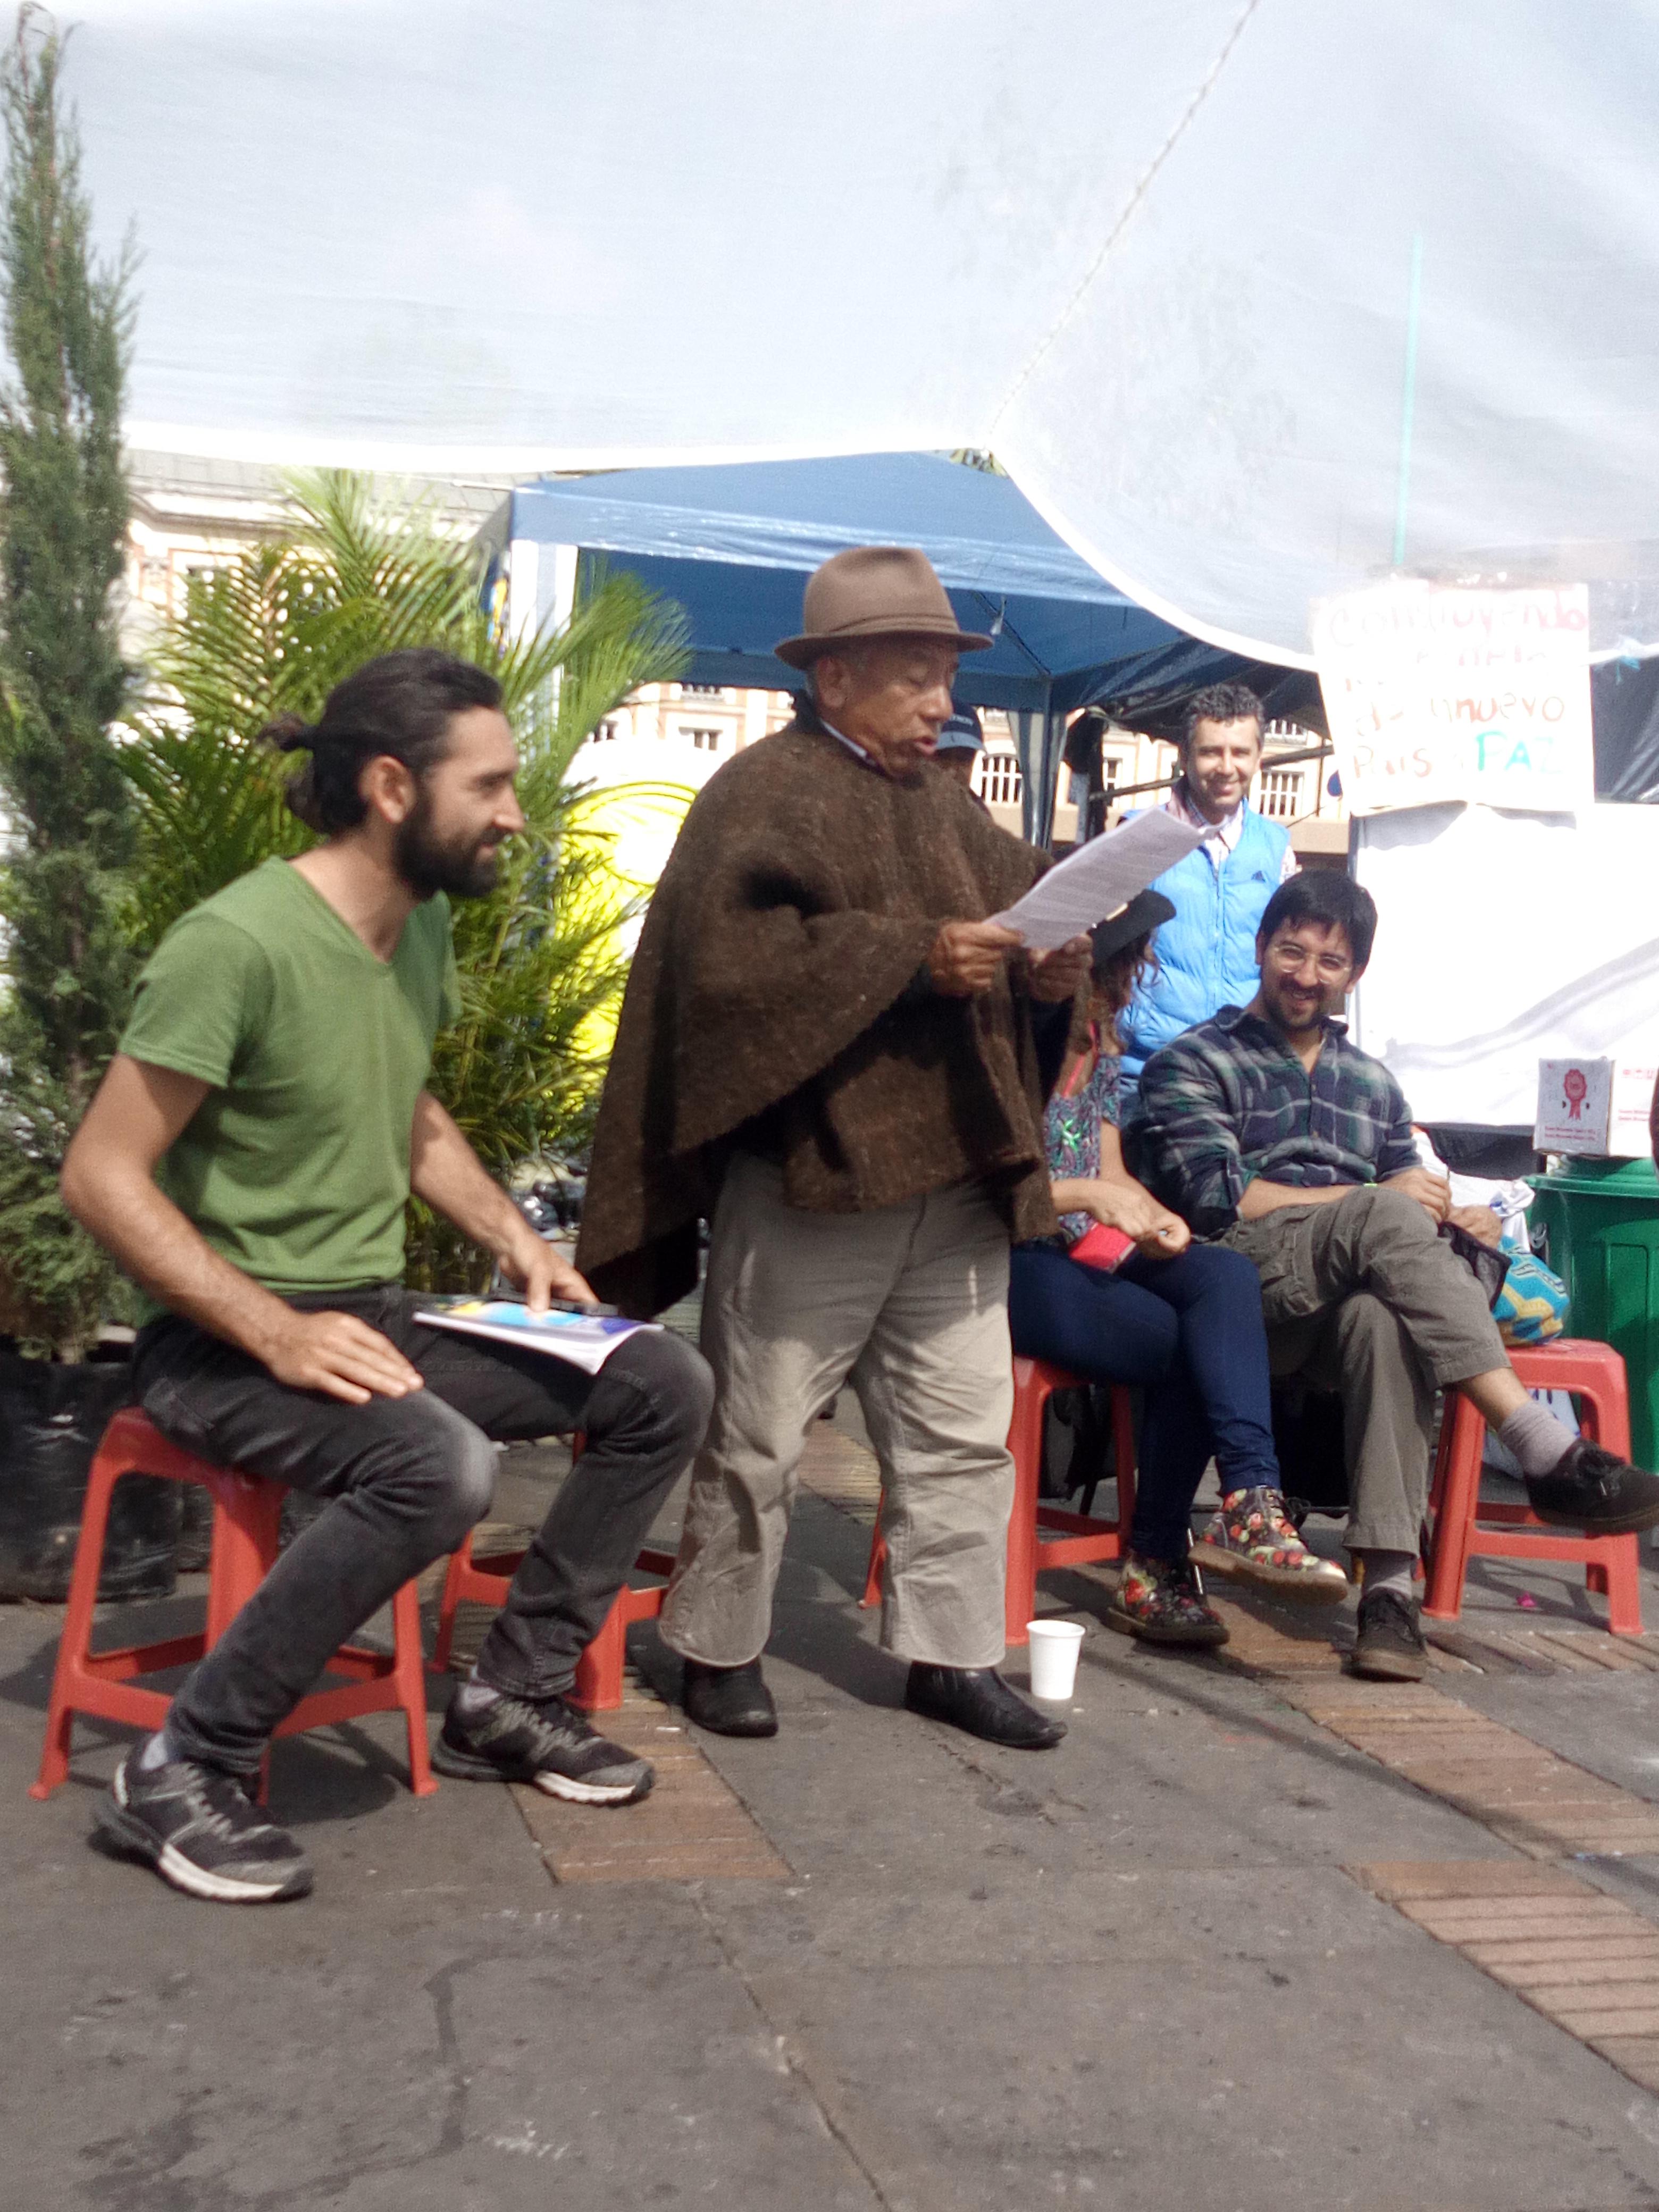 Colombia_2016_Michael_Joseph_Asamblea_Copla.jpg